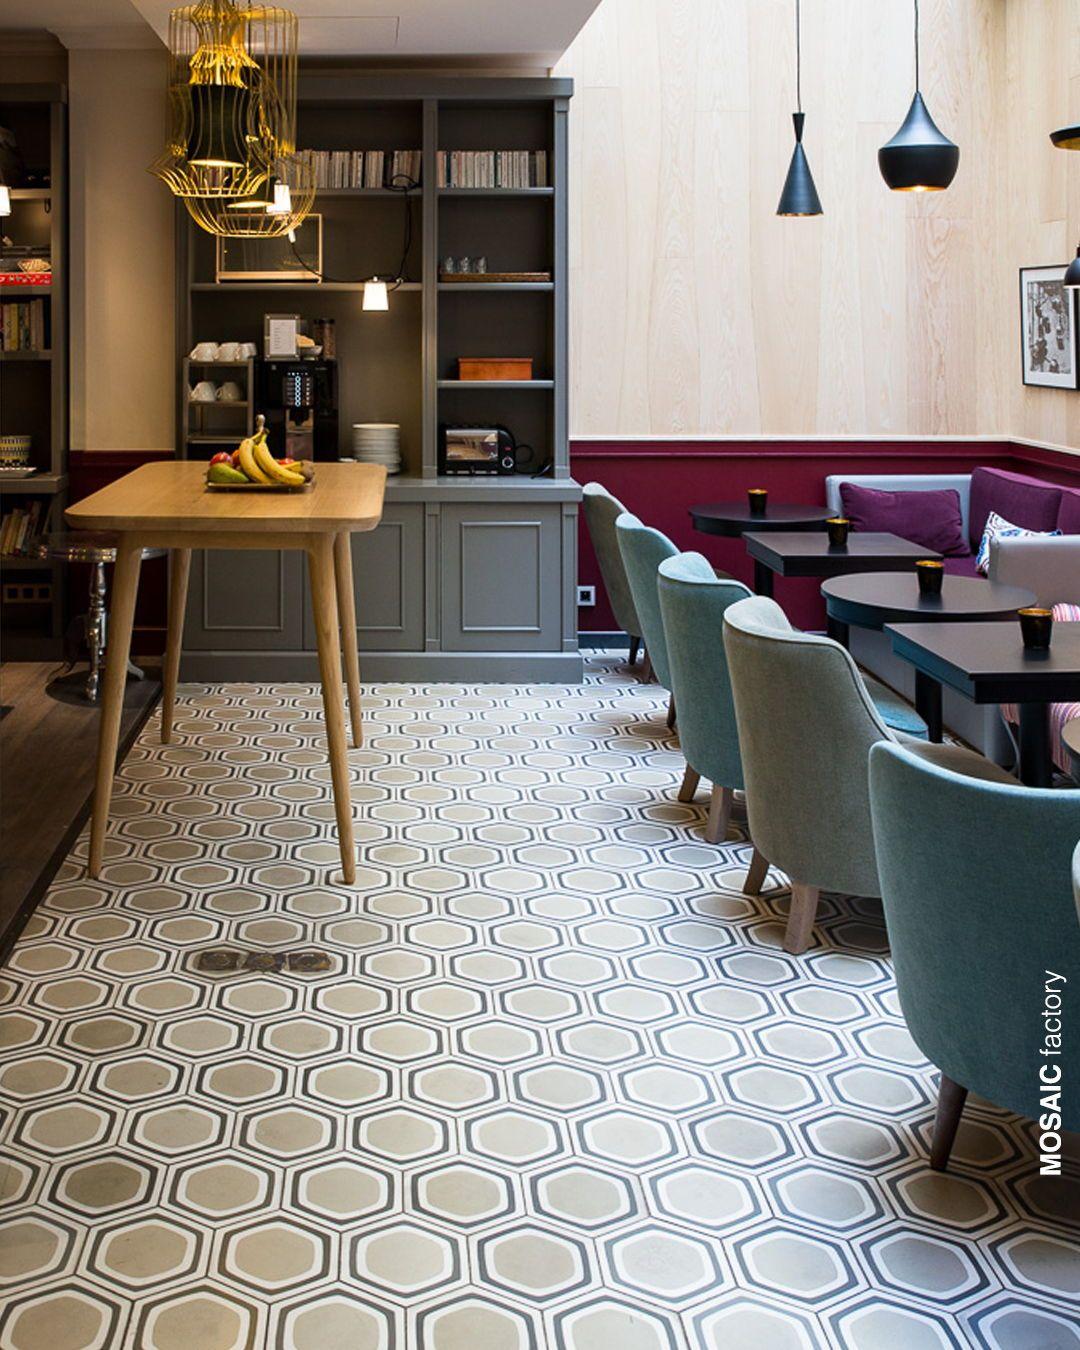 Beige, white and grey hexagonal cement floor tiles with